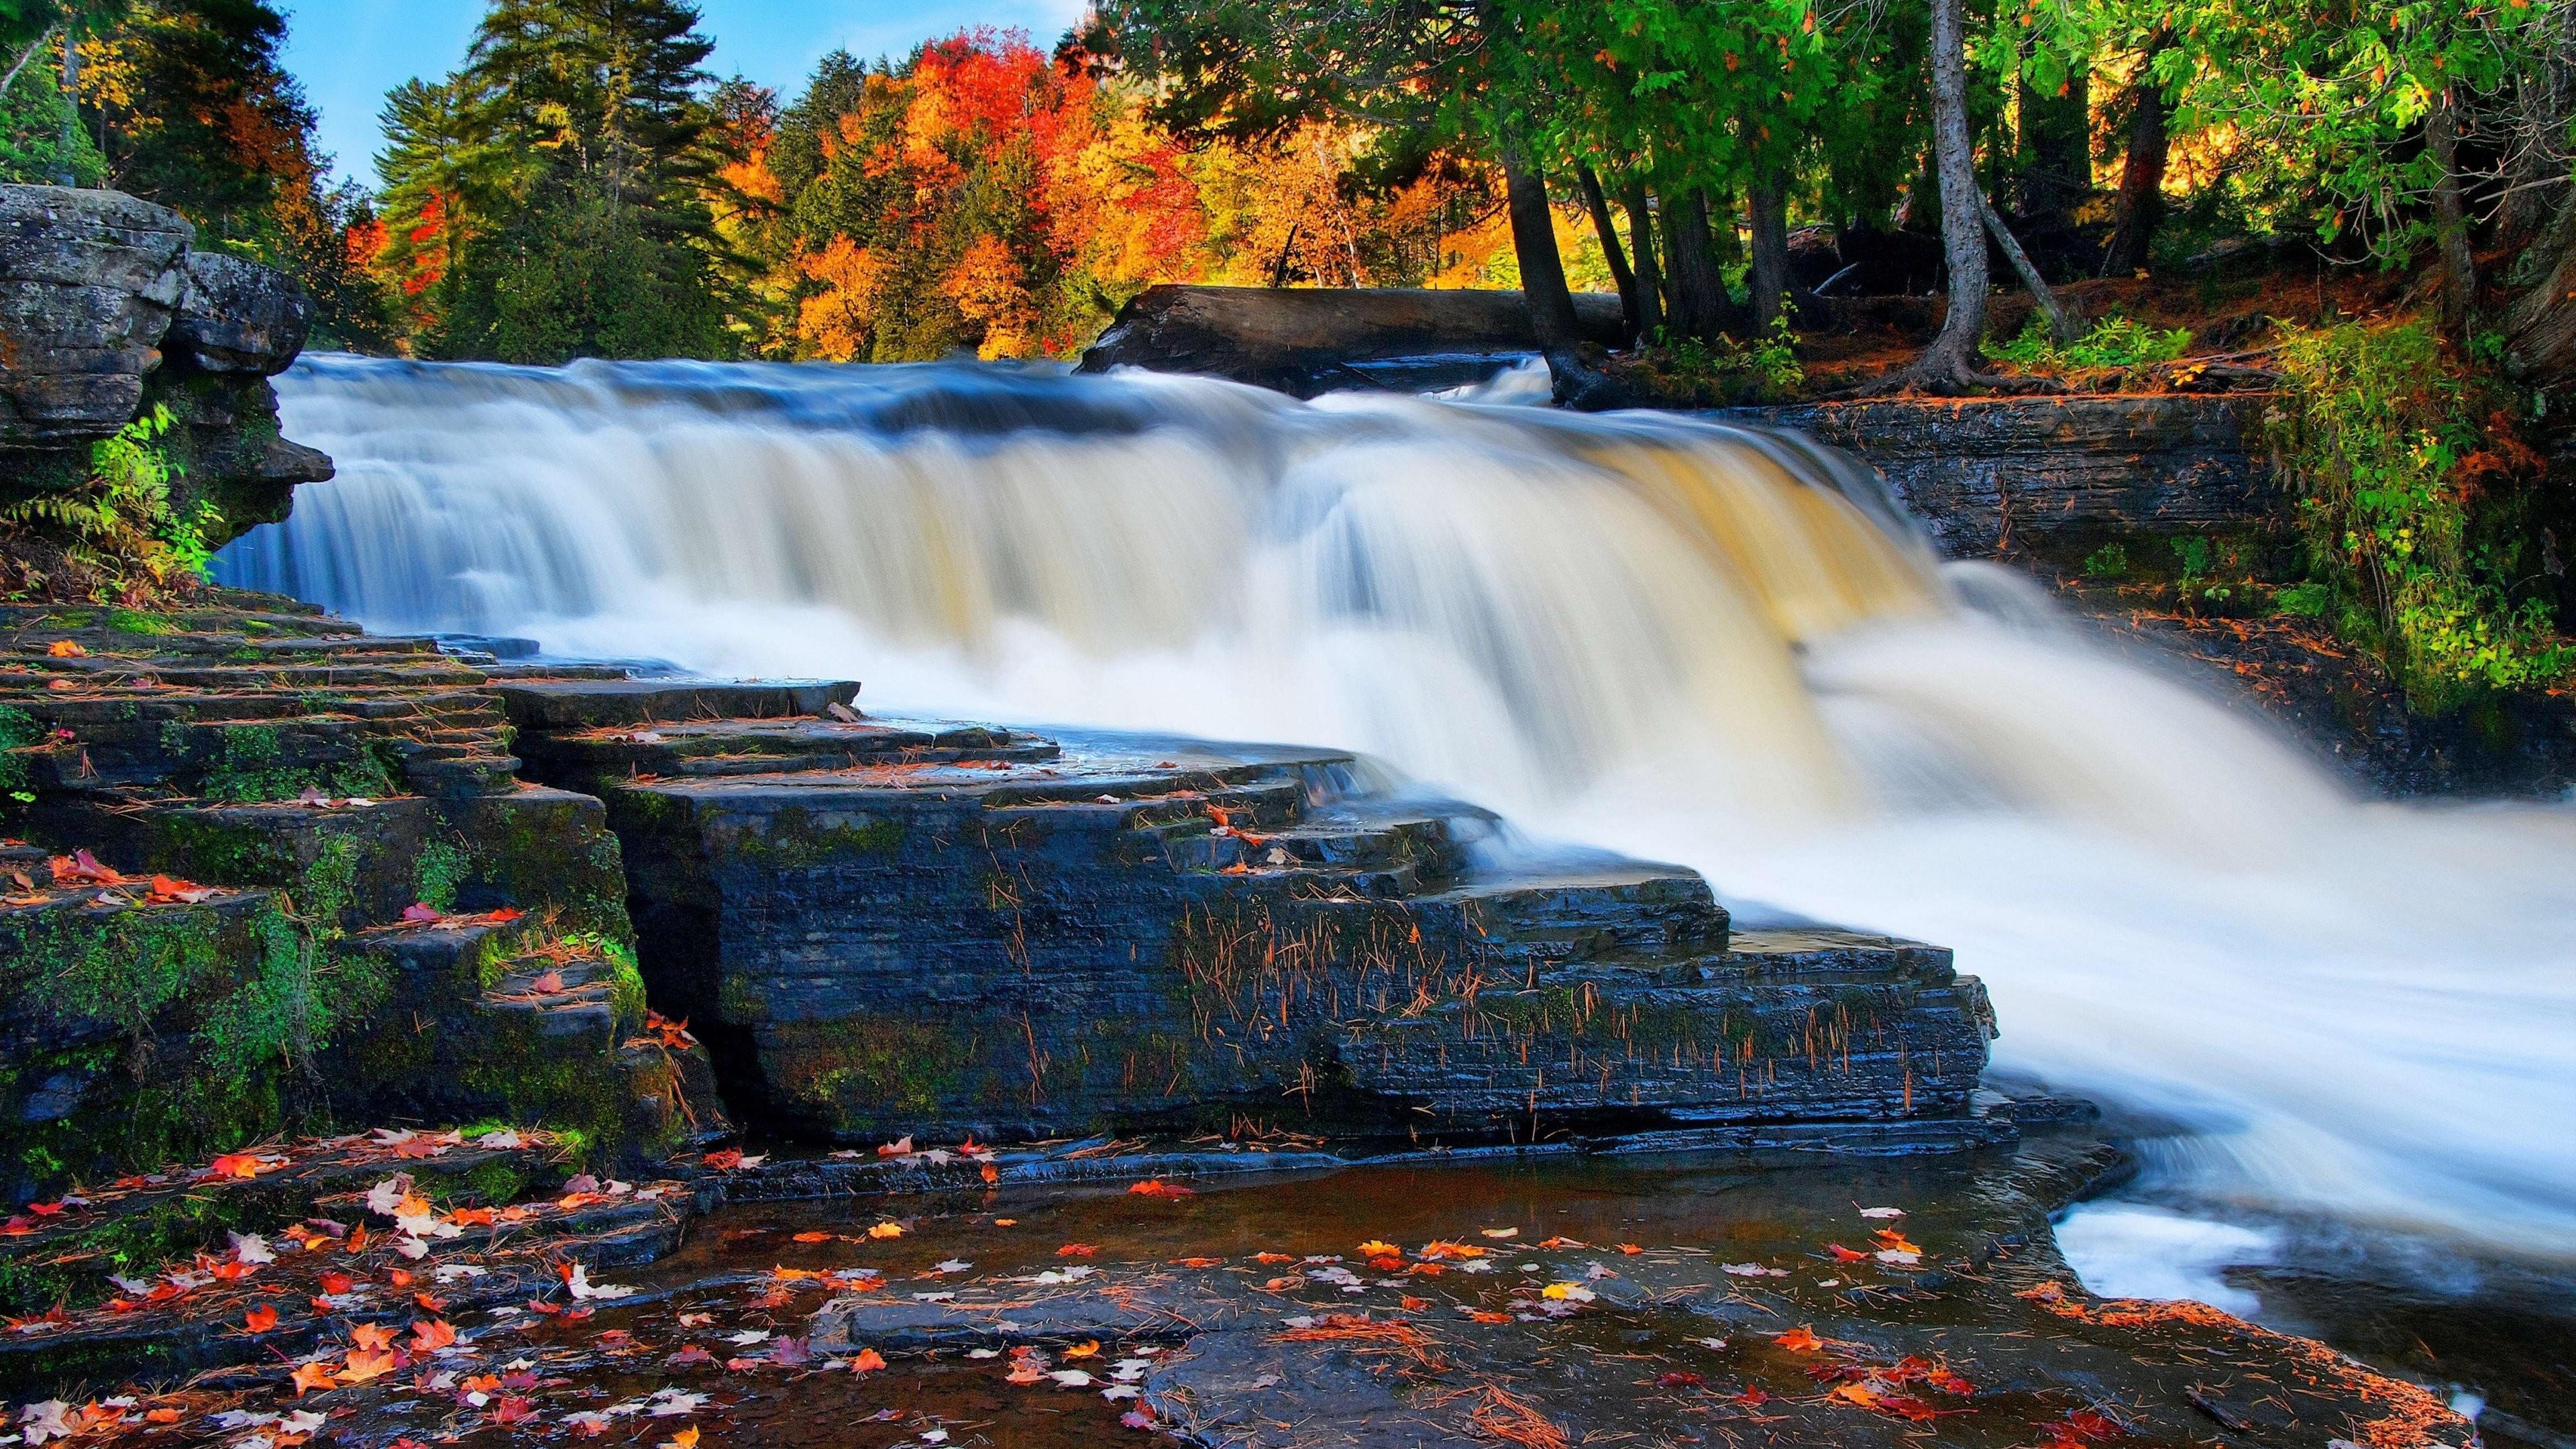 Wallpaper Forest 5k 4k Wallpaper River Waterfall